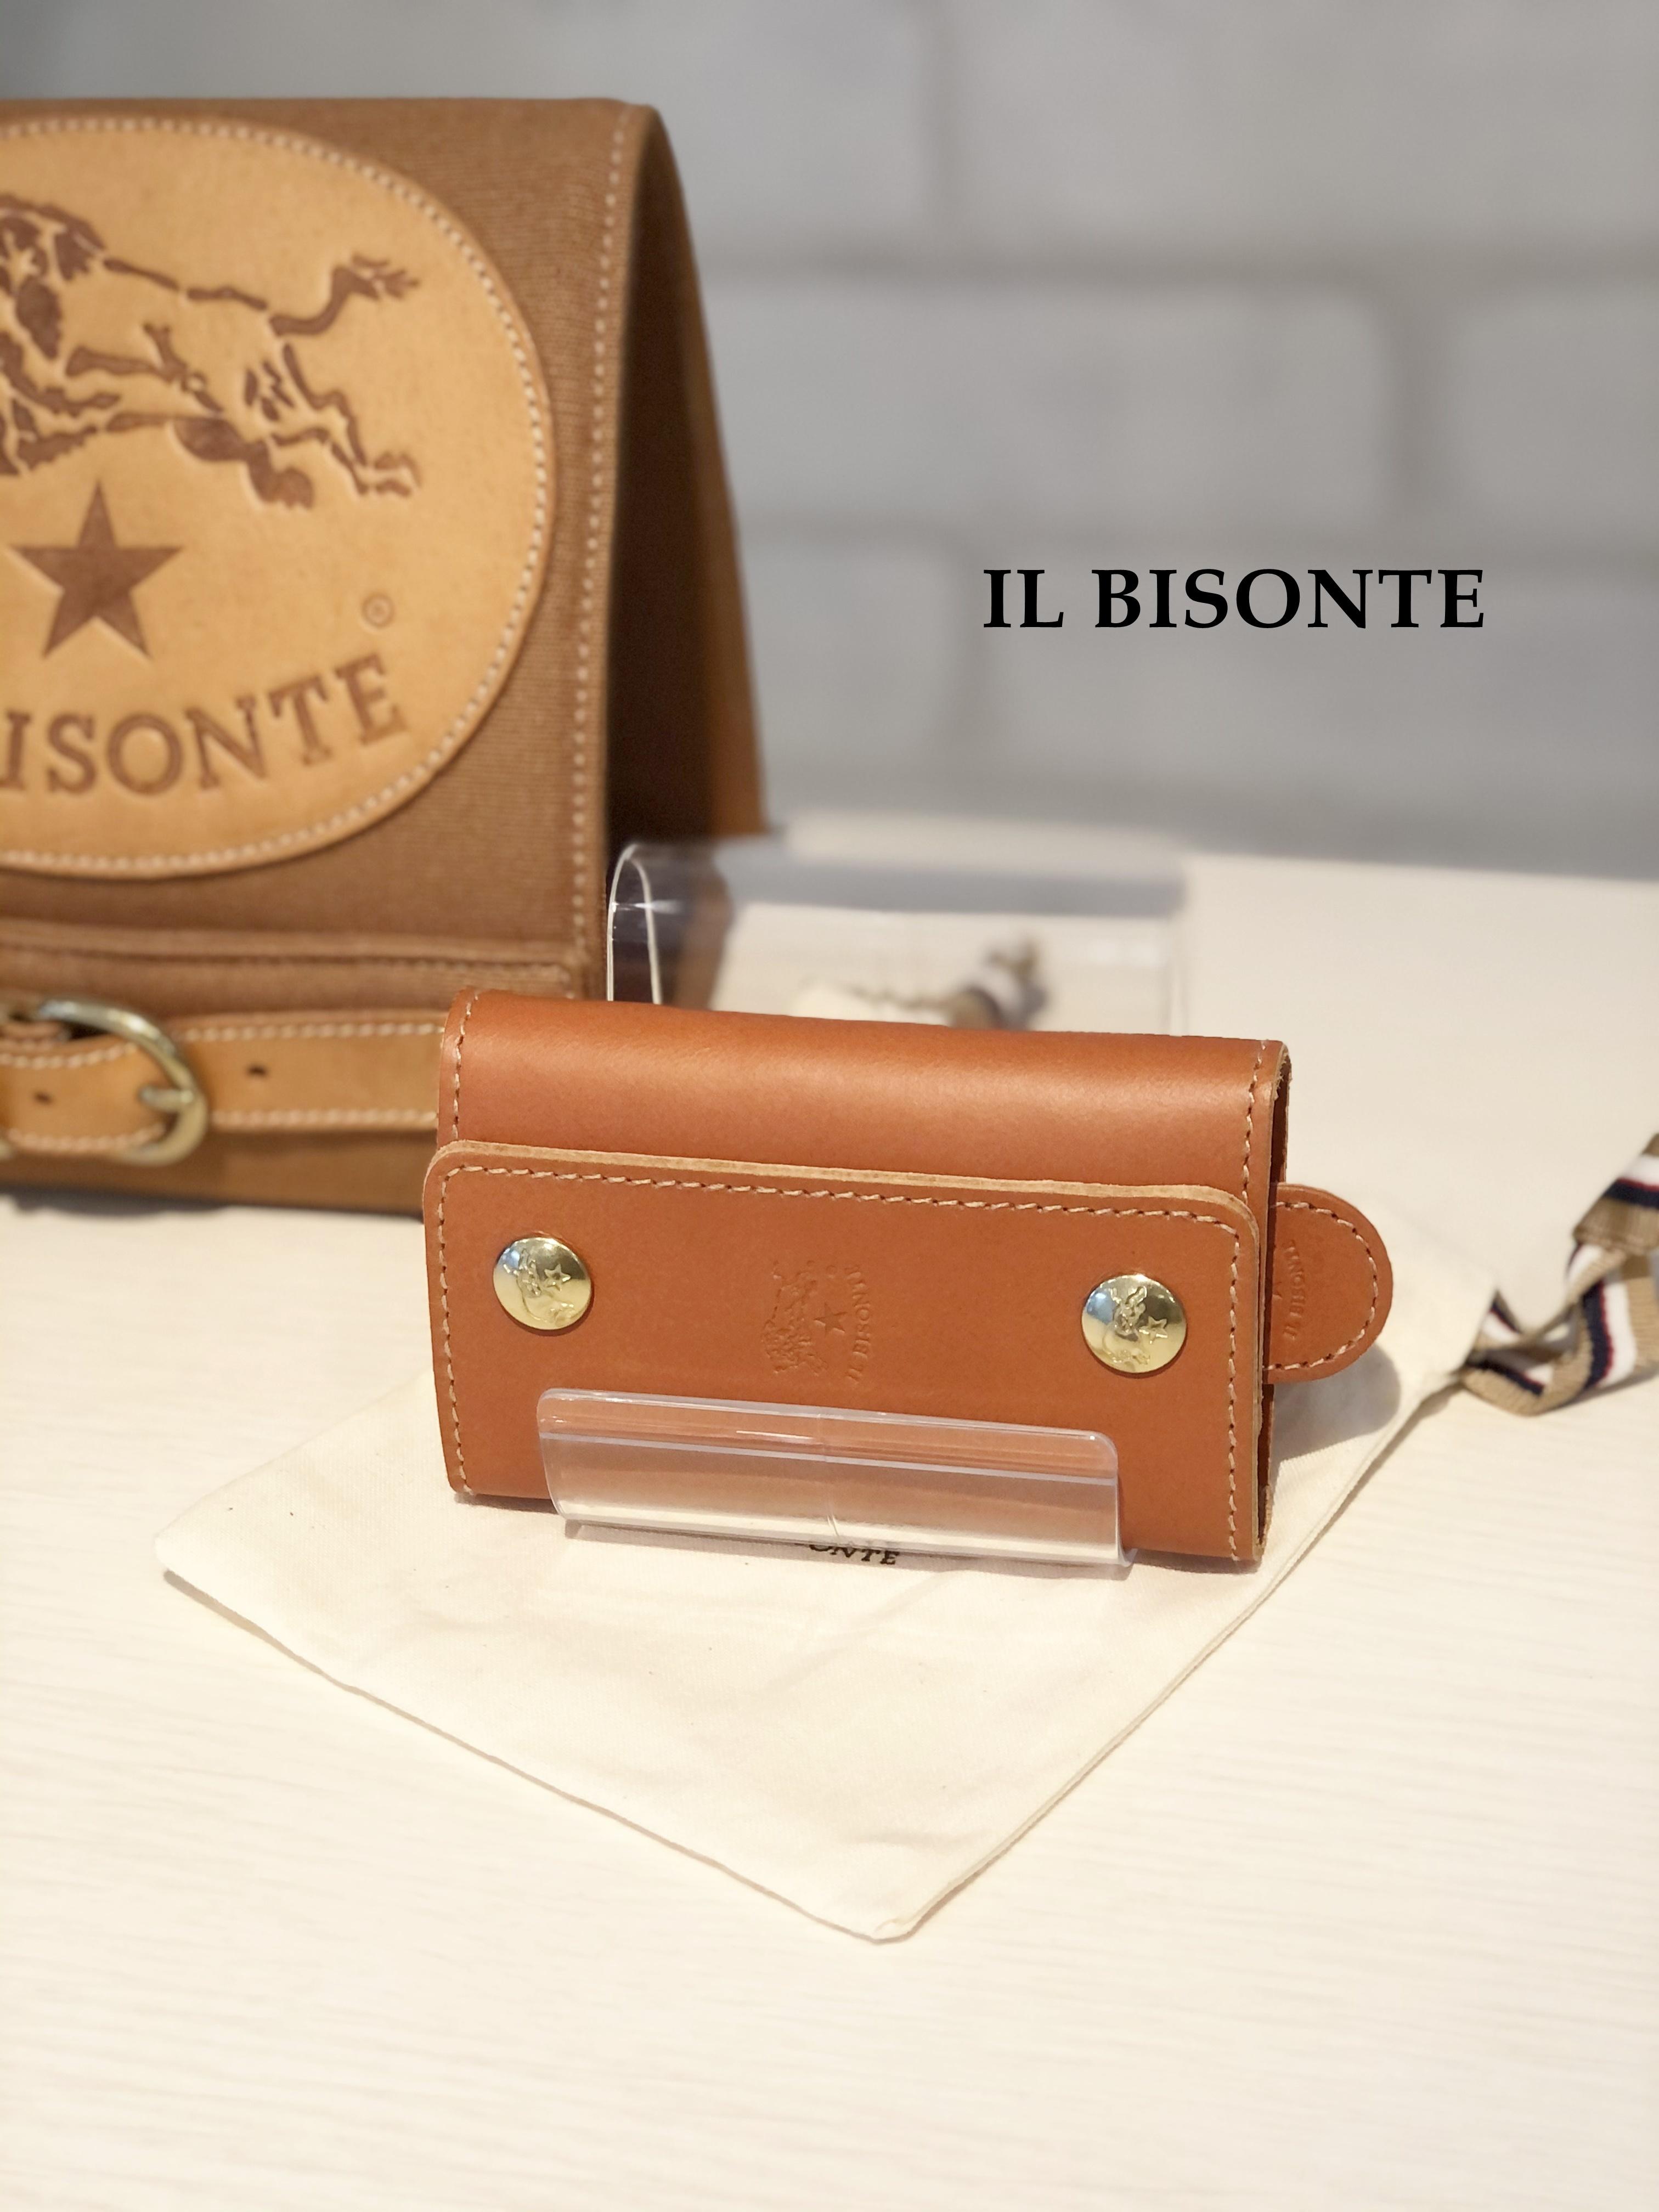 IL BISONTE(イルビゾンテ)/6連キーケース/9290(ヤケヌメ)